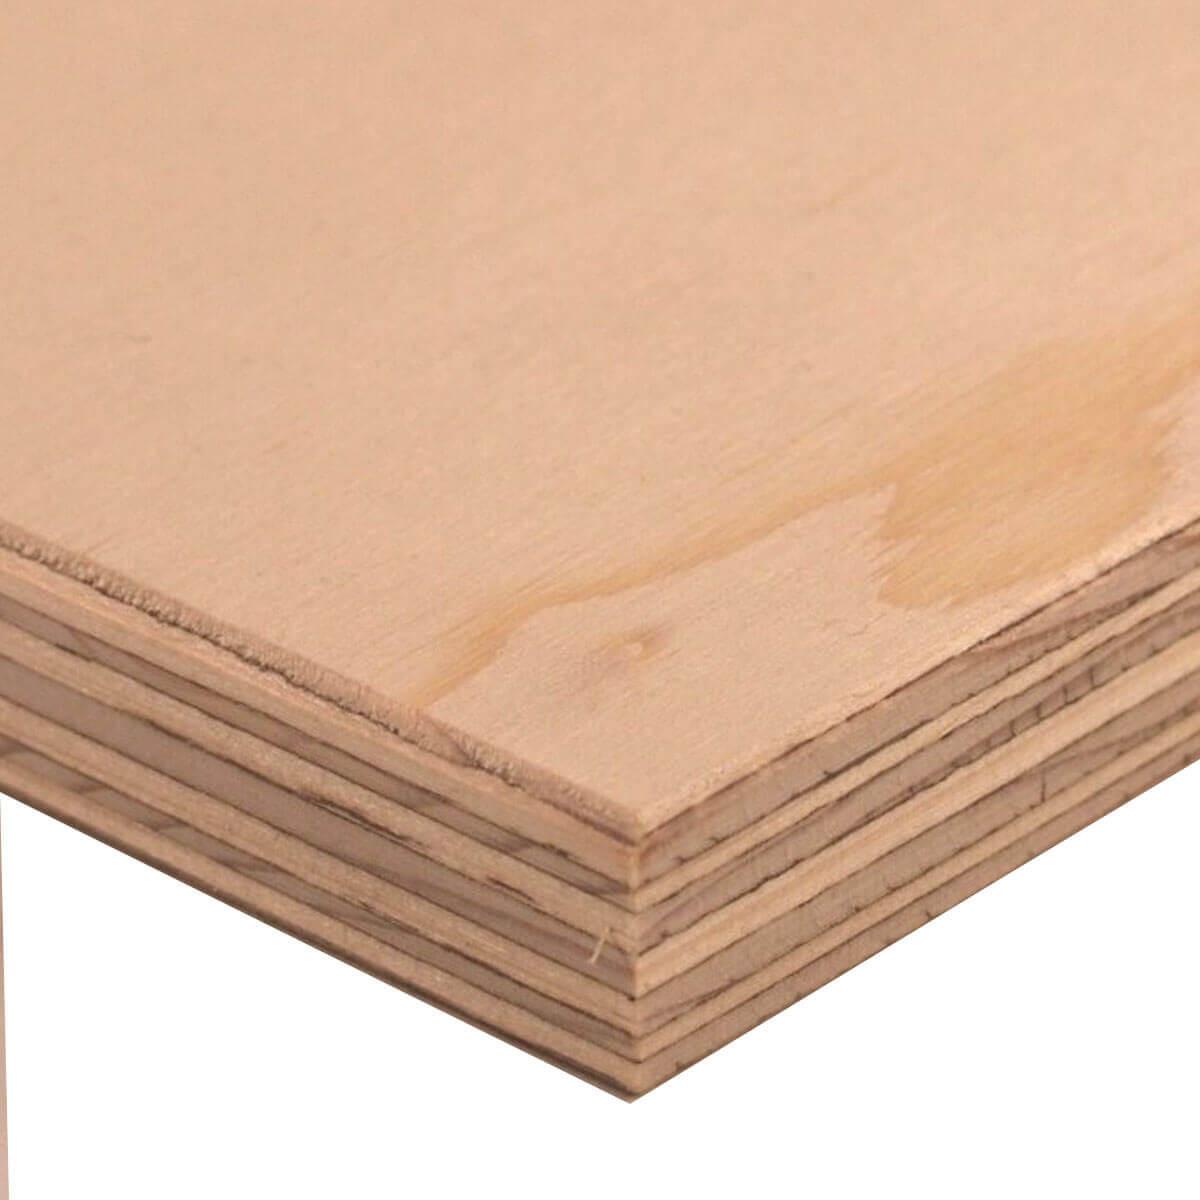 Standard Fir Plywood - 4 x 8 - 15.5 mm - 5/8-in